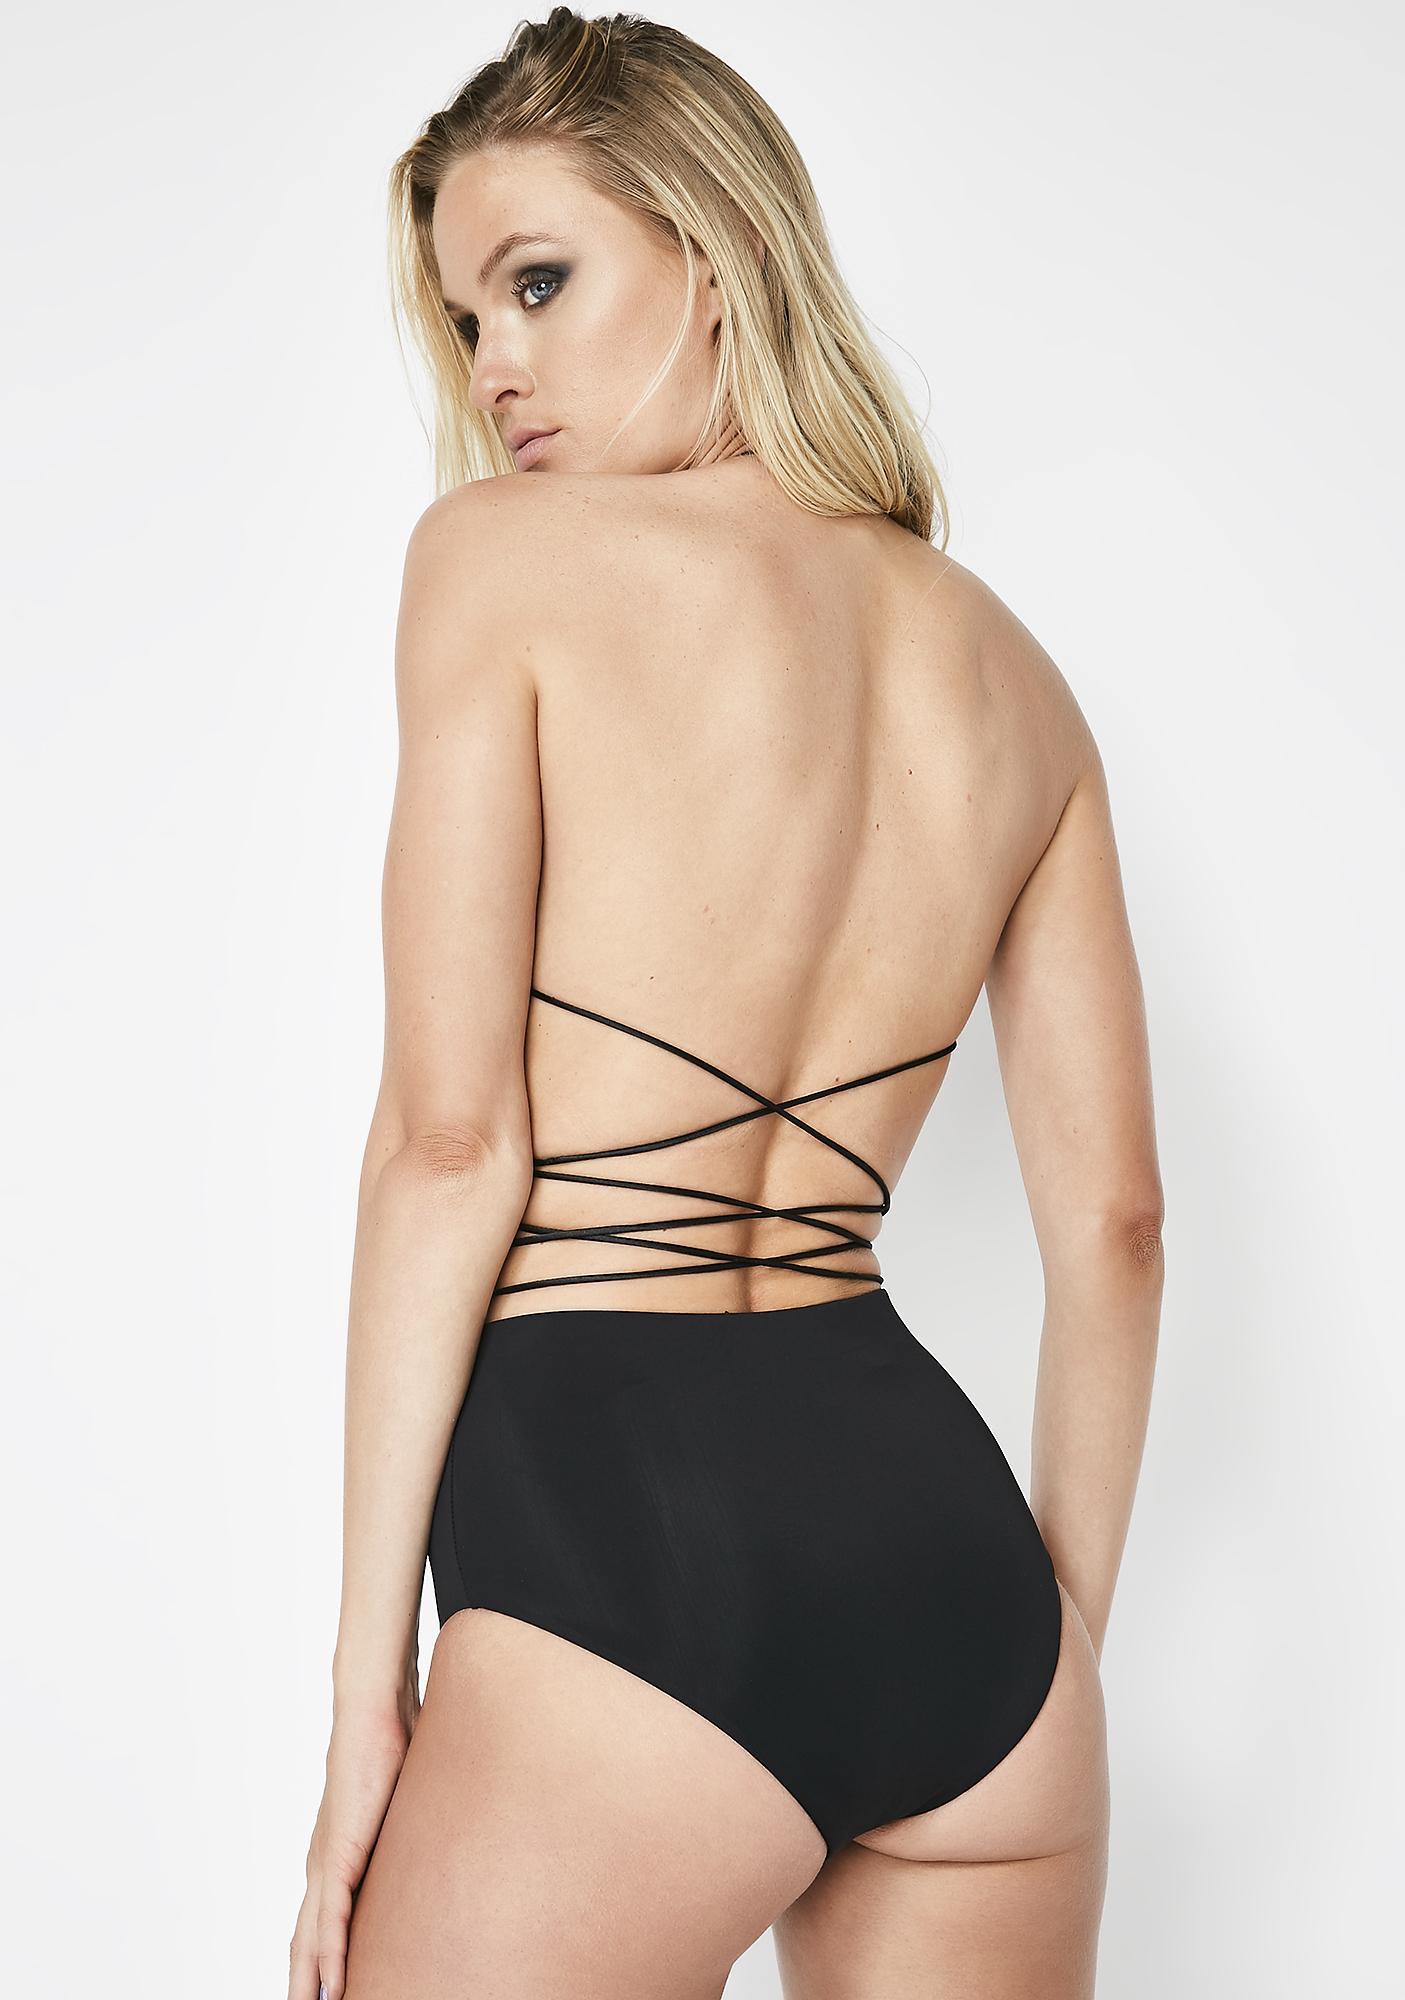 Kiki Riki Wink Wink Lace Up Shorts